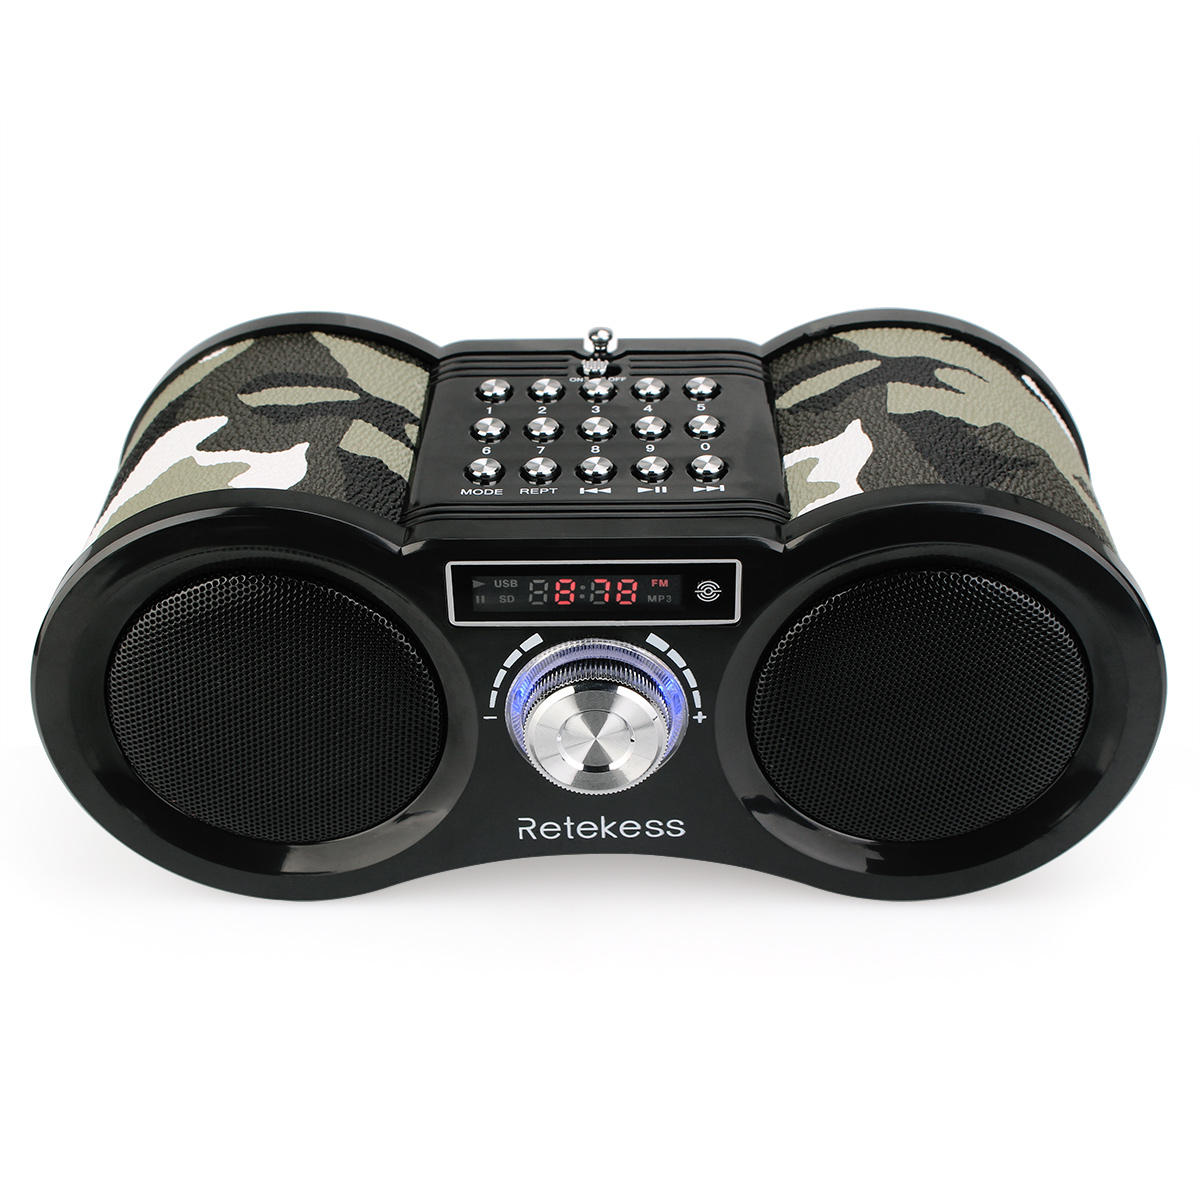 Retekess TIVDIO Digital Display FM AM Stereo Radio Dual 1.6W Bass Loudspeaker USB Disk SD Card MP3 Player AUX Speaker